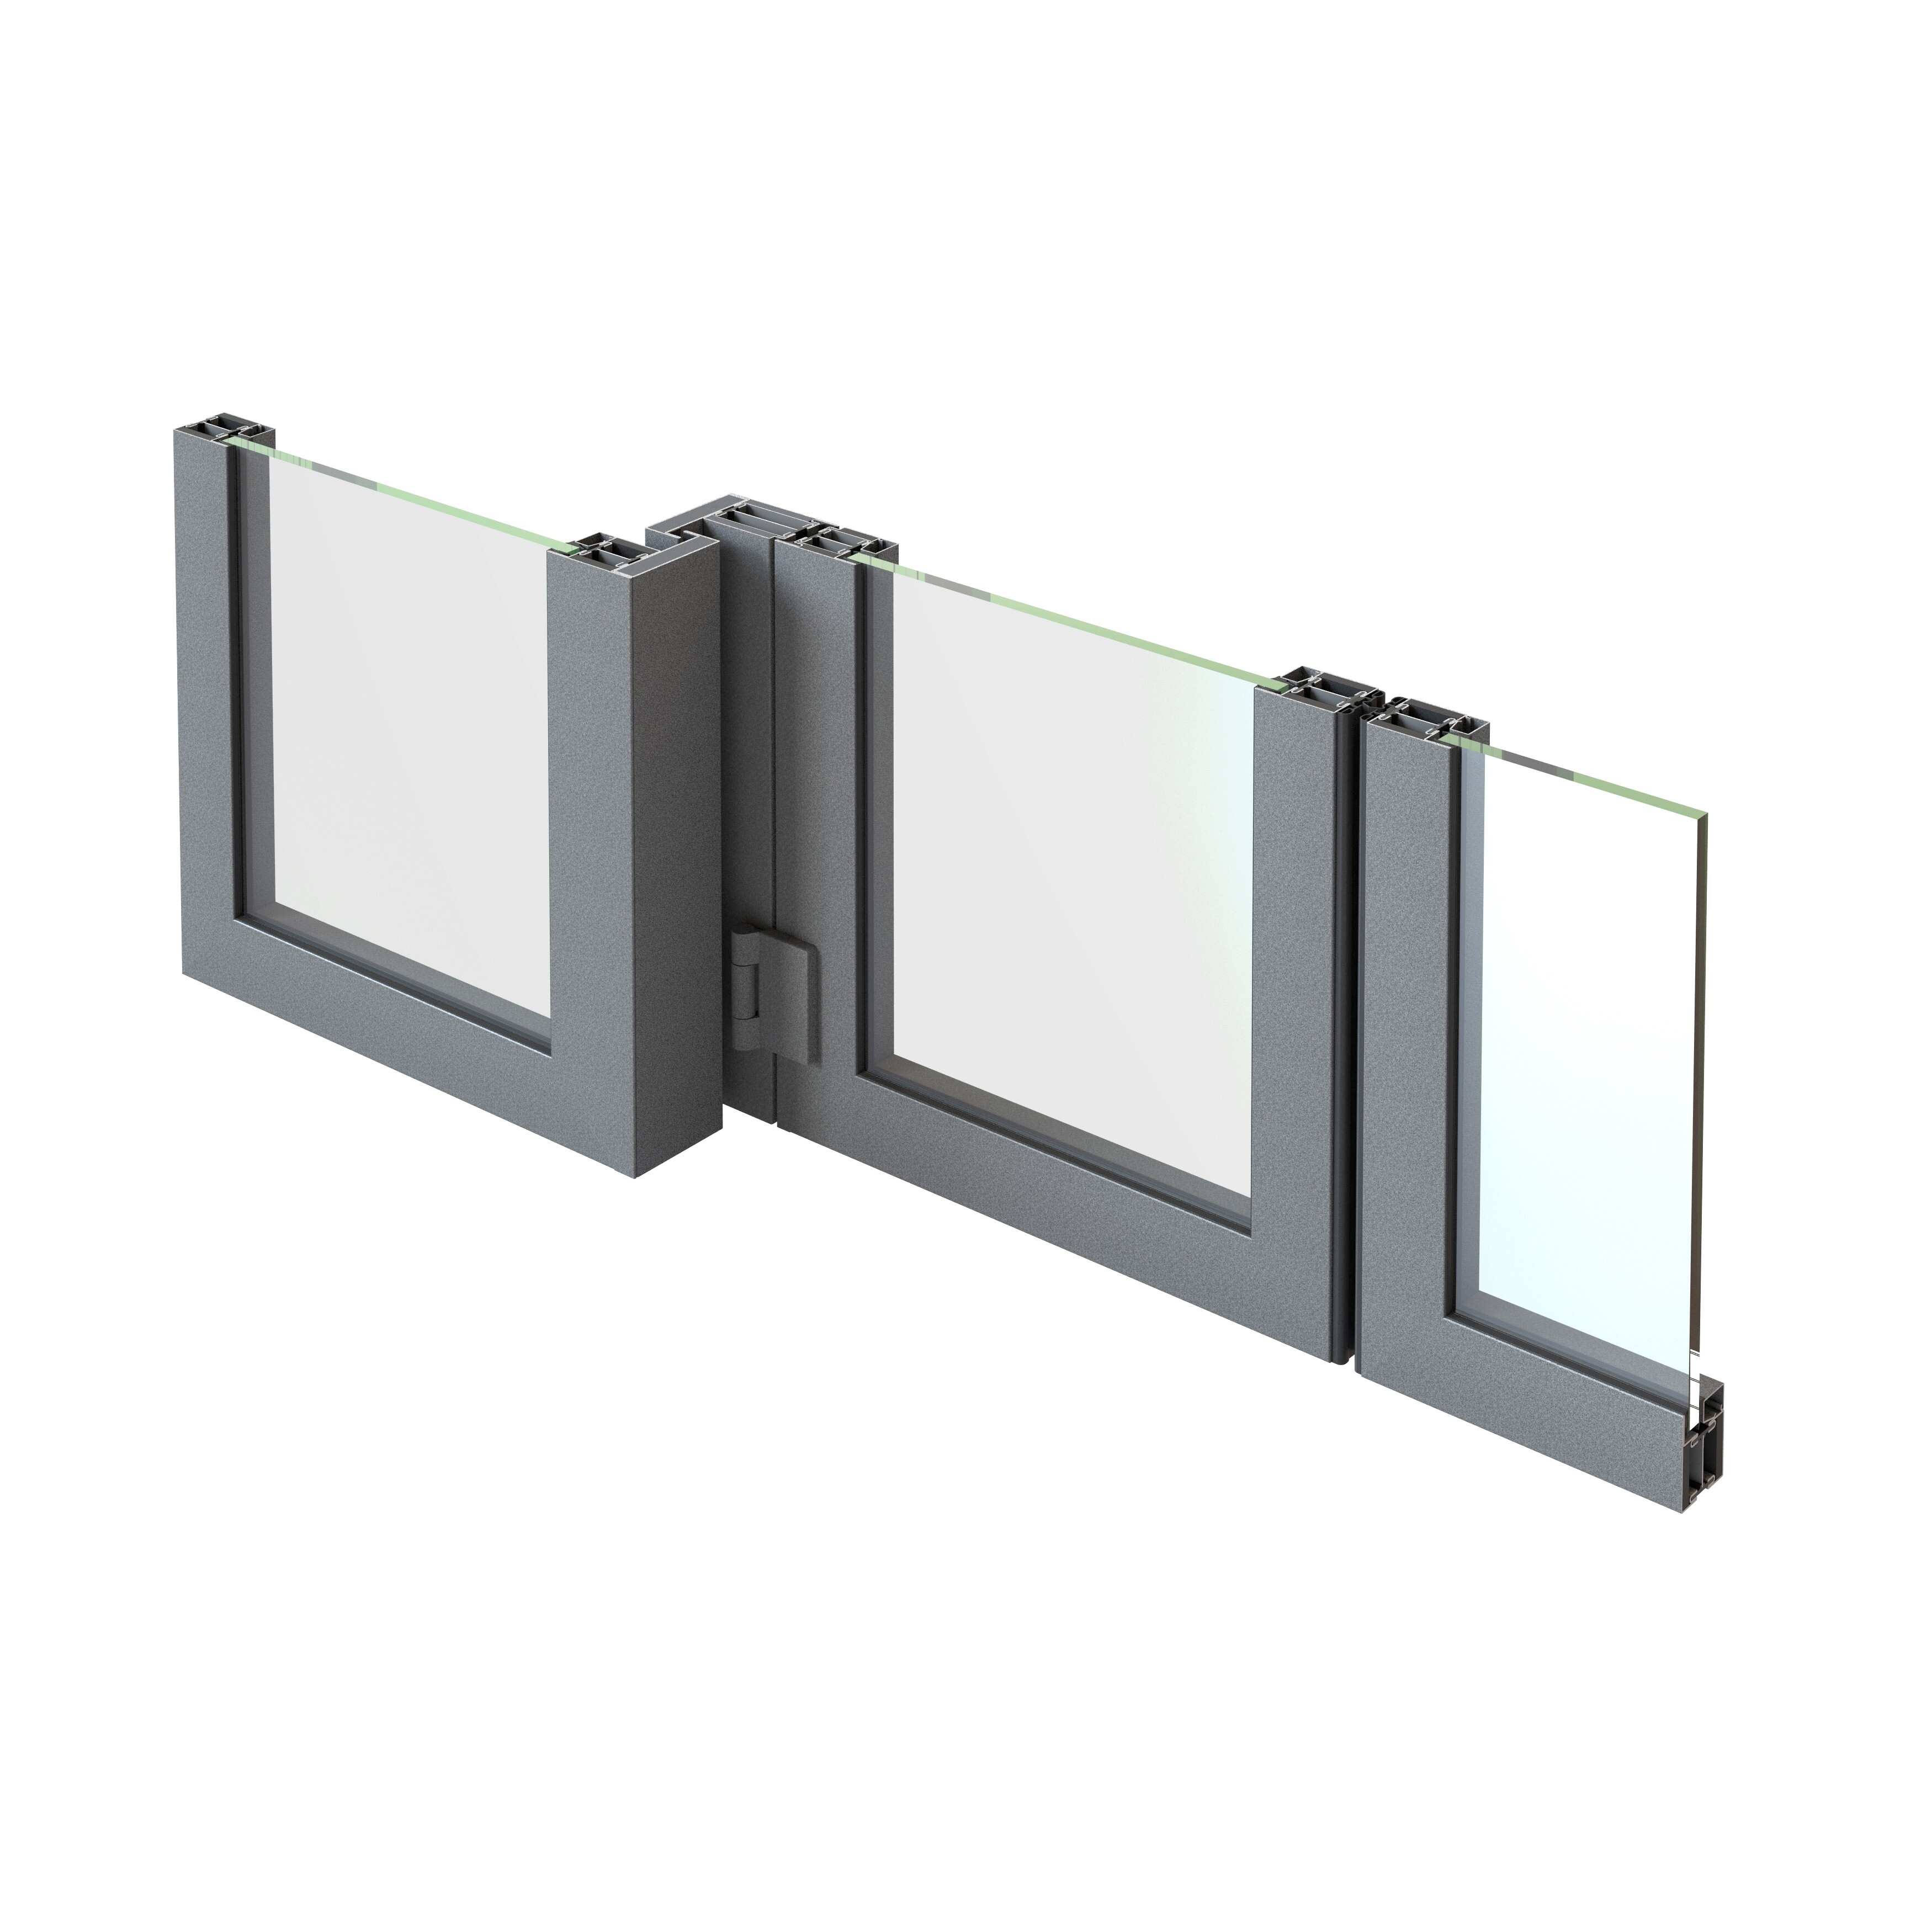 Janisol 2 EI30 fire protection sliding door